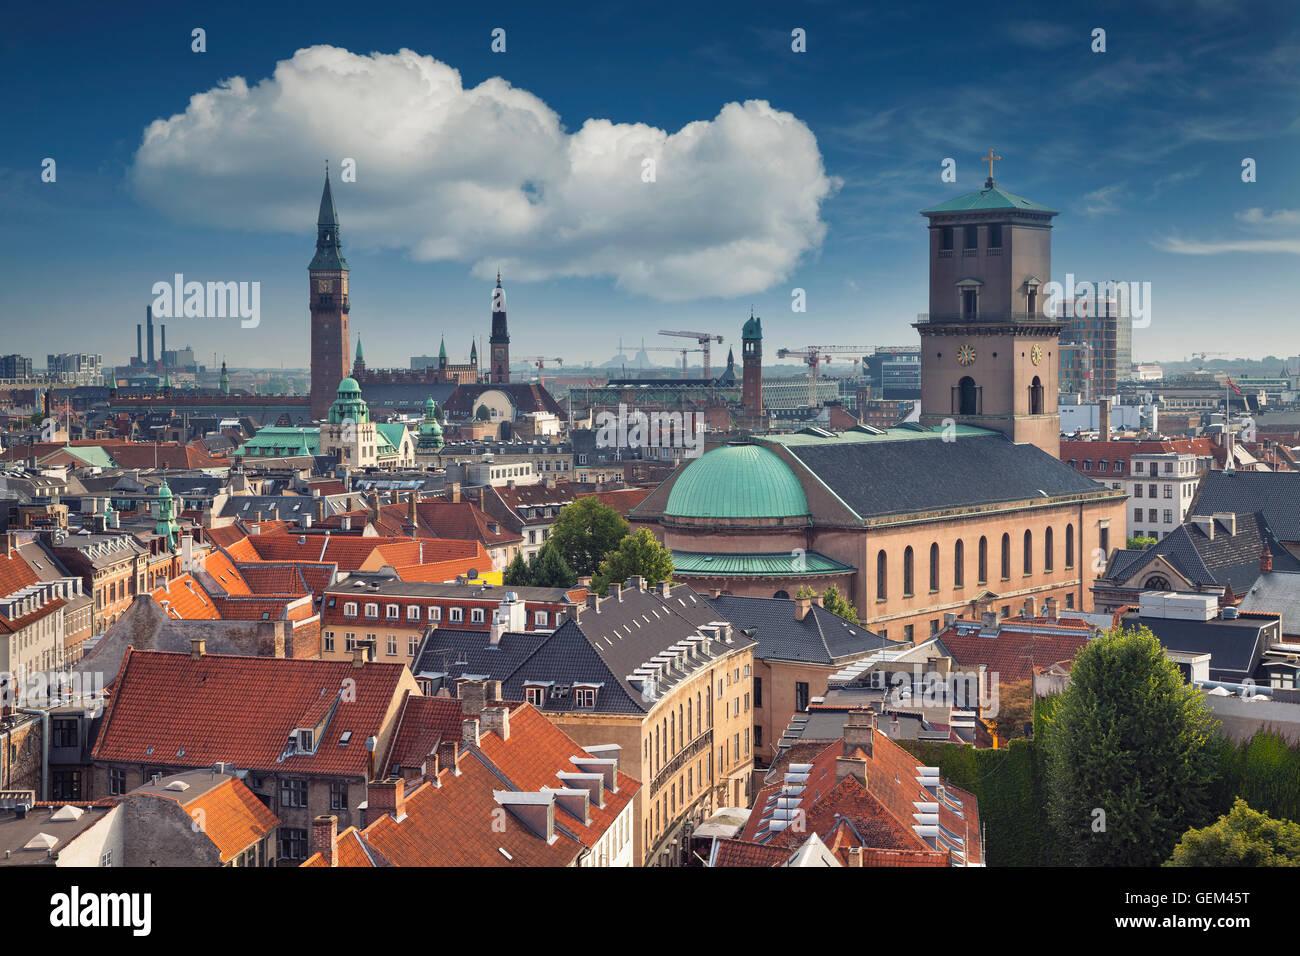 Copenhagen. Image of Copenhagen skyline during sunny day. - Stock Image